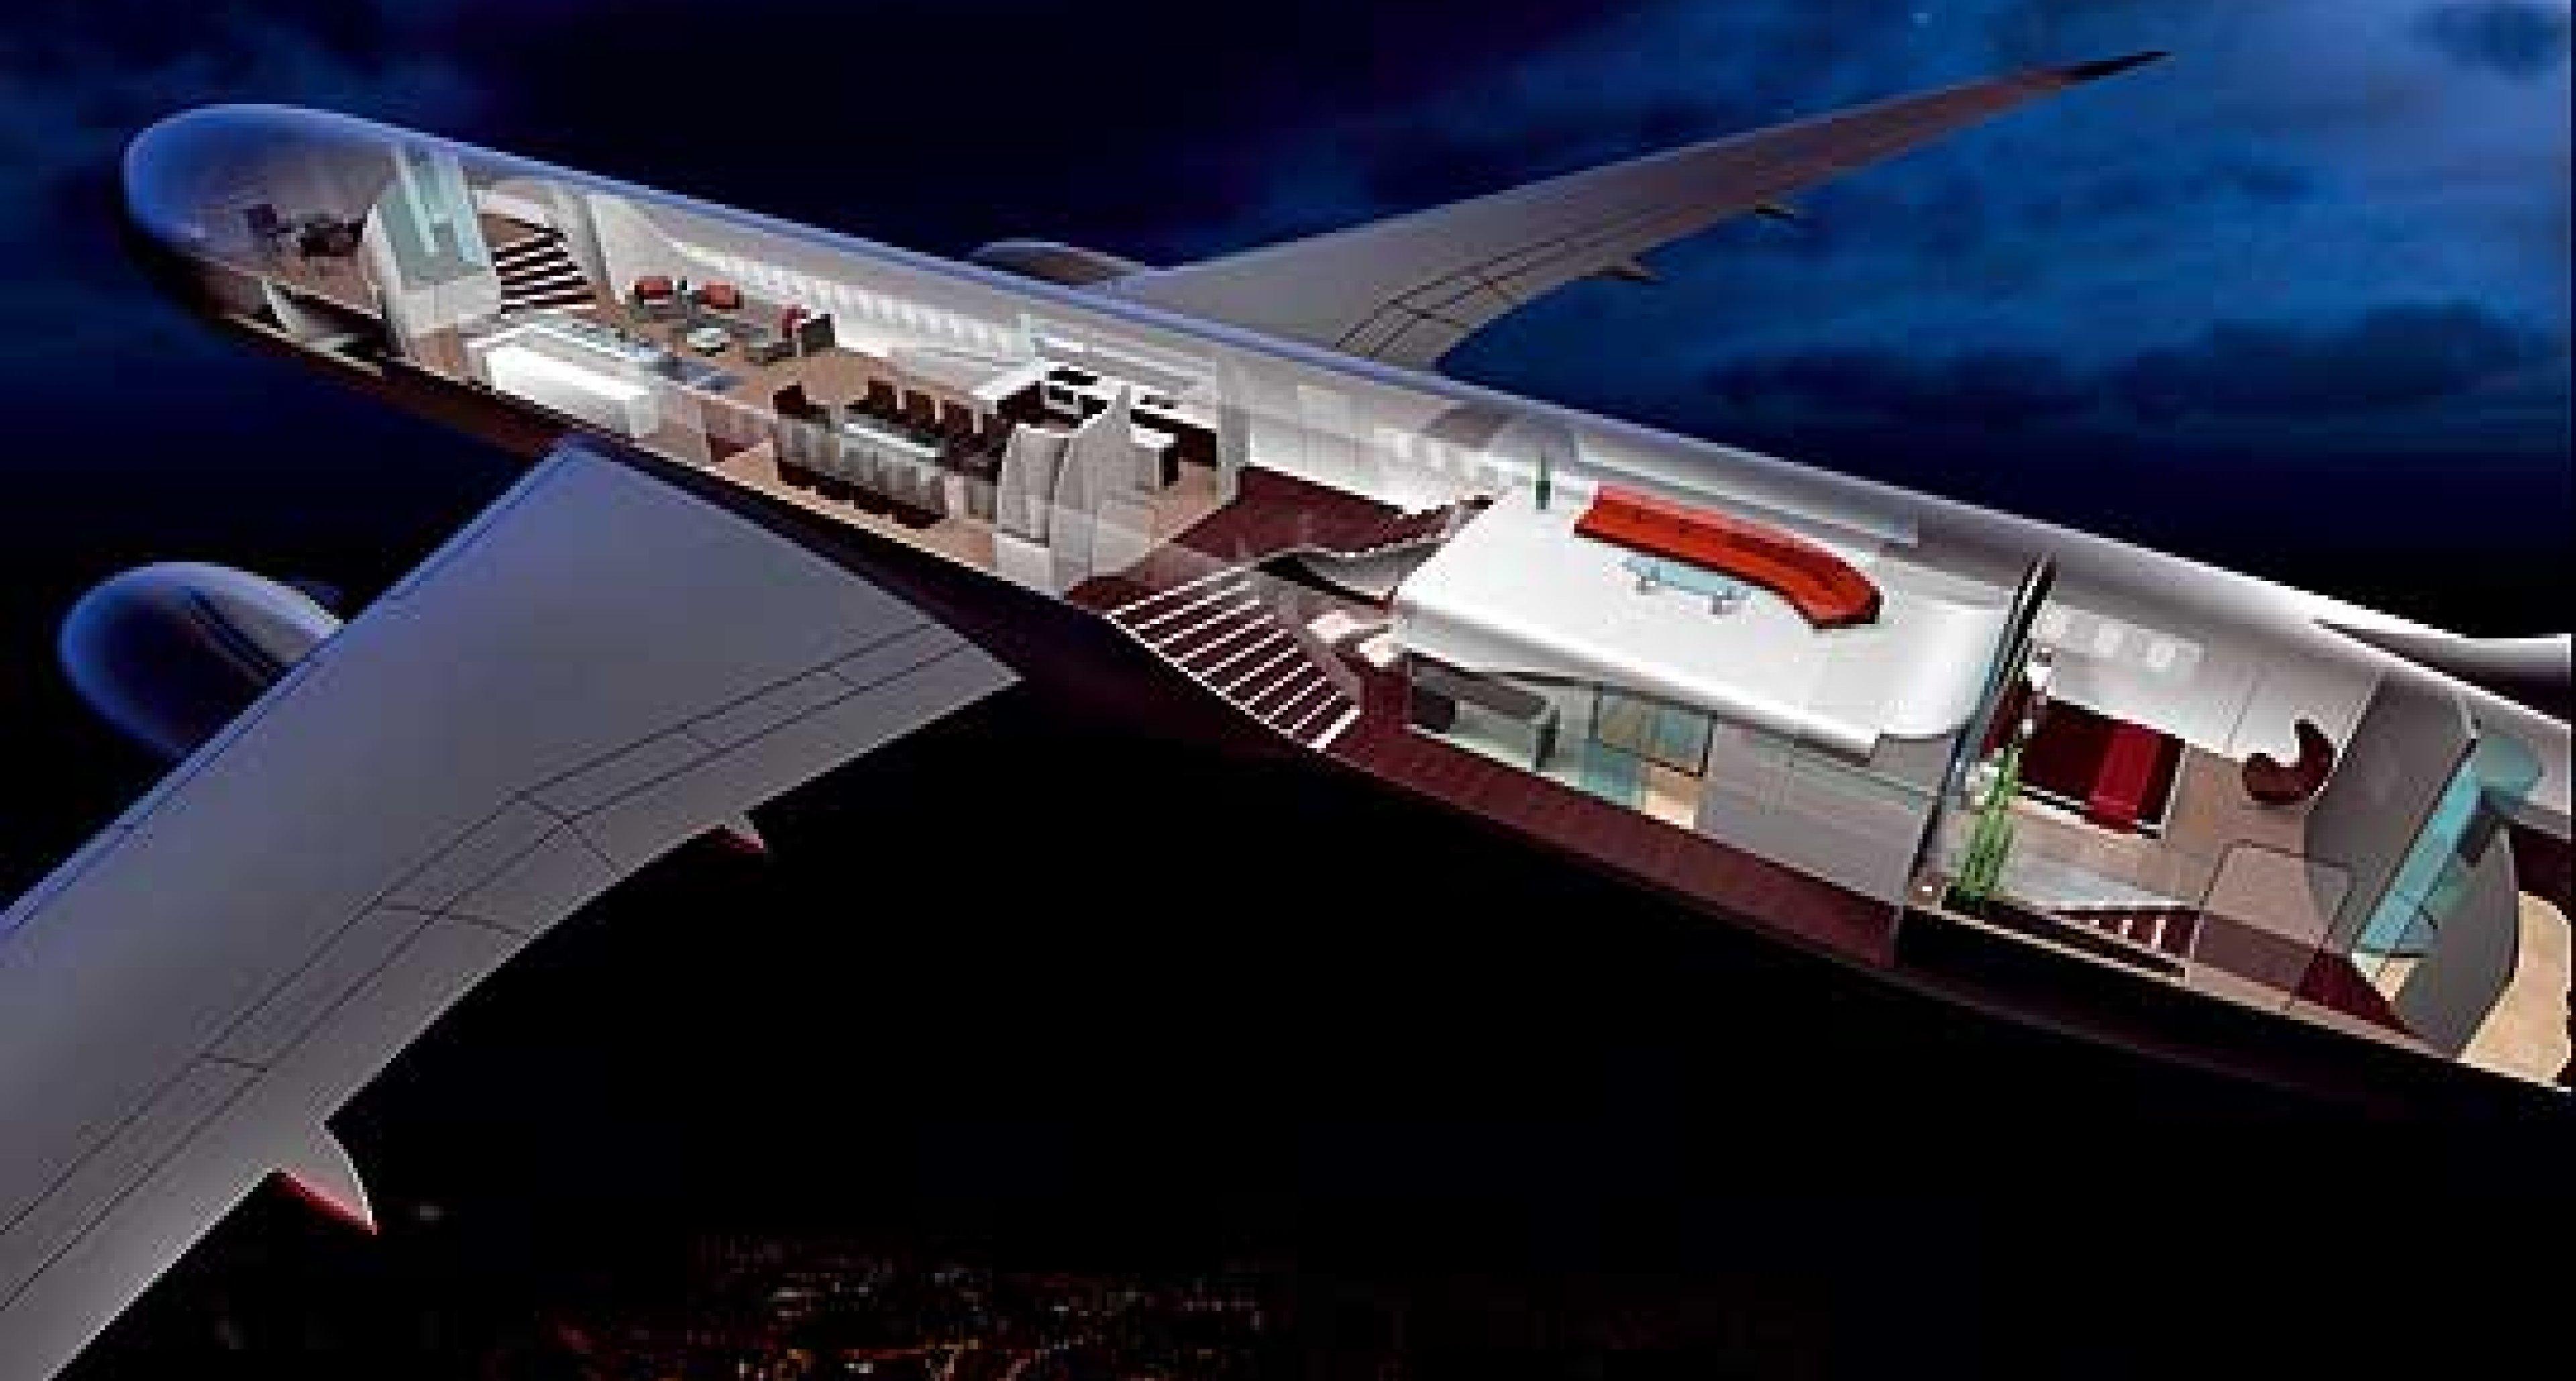 Boeing 787 Dreamliner Business-Jet